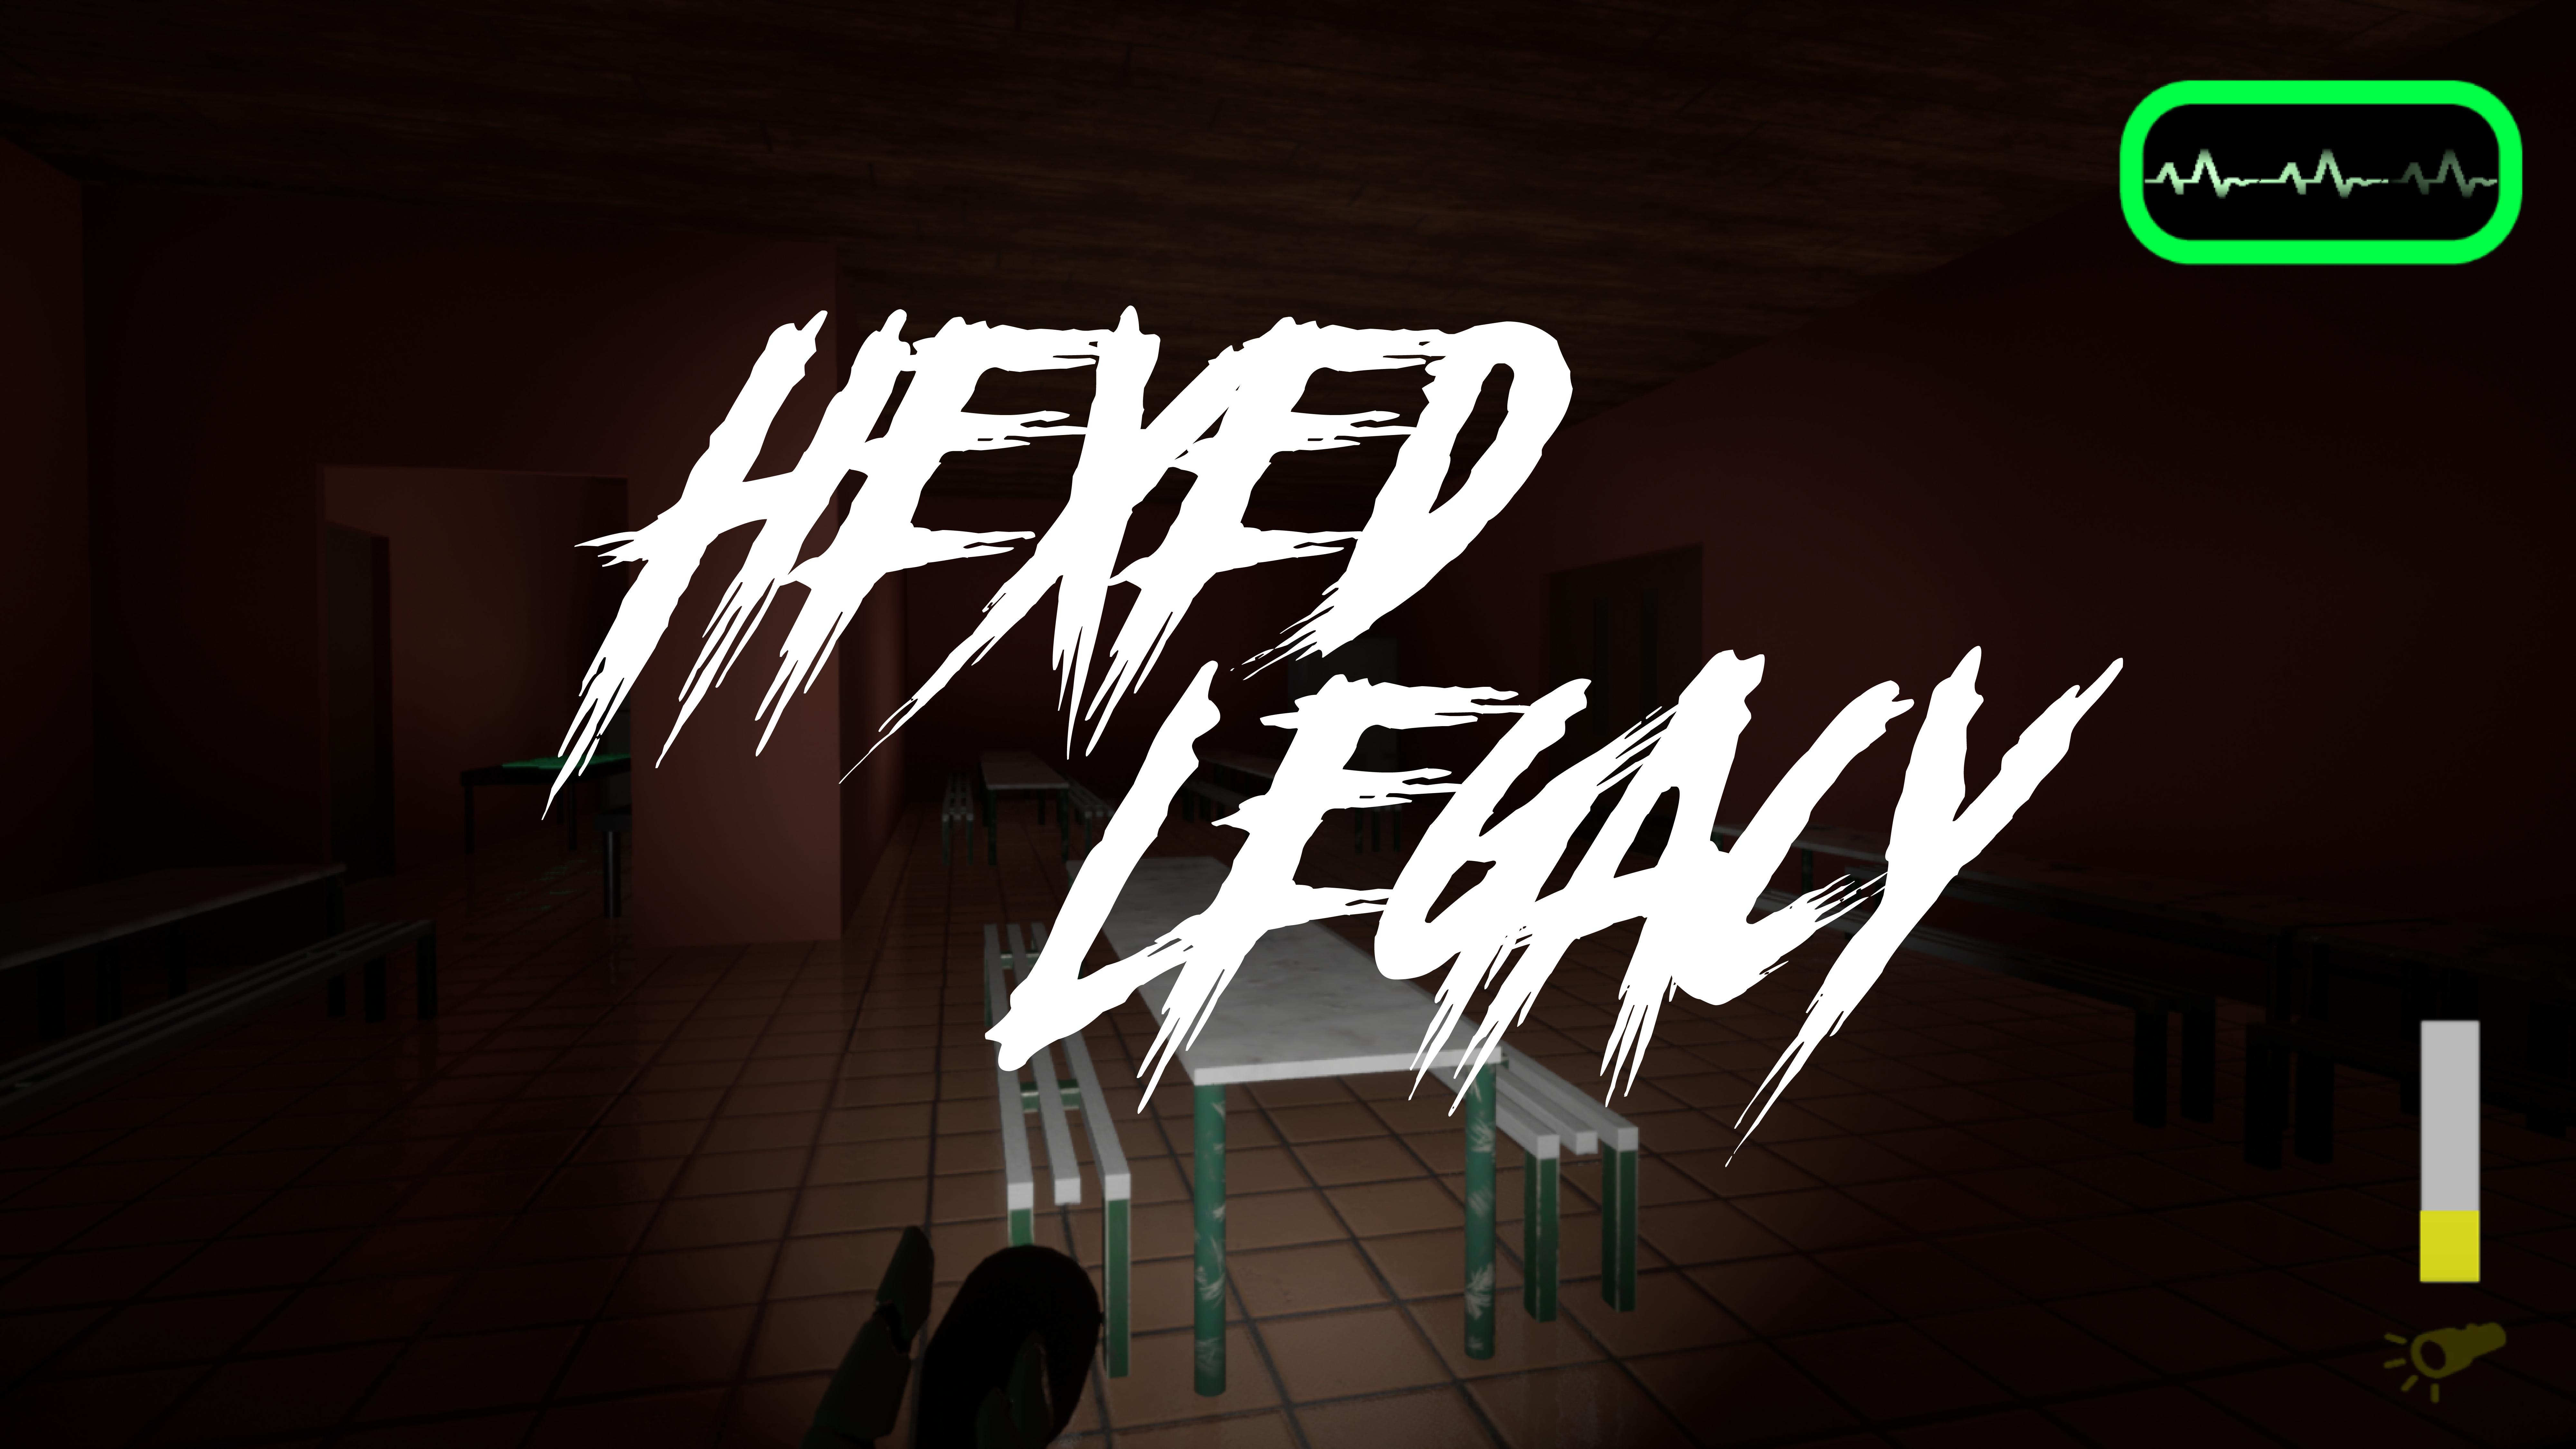 Hexed Legacy